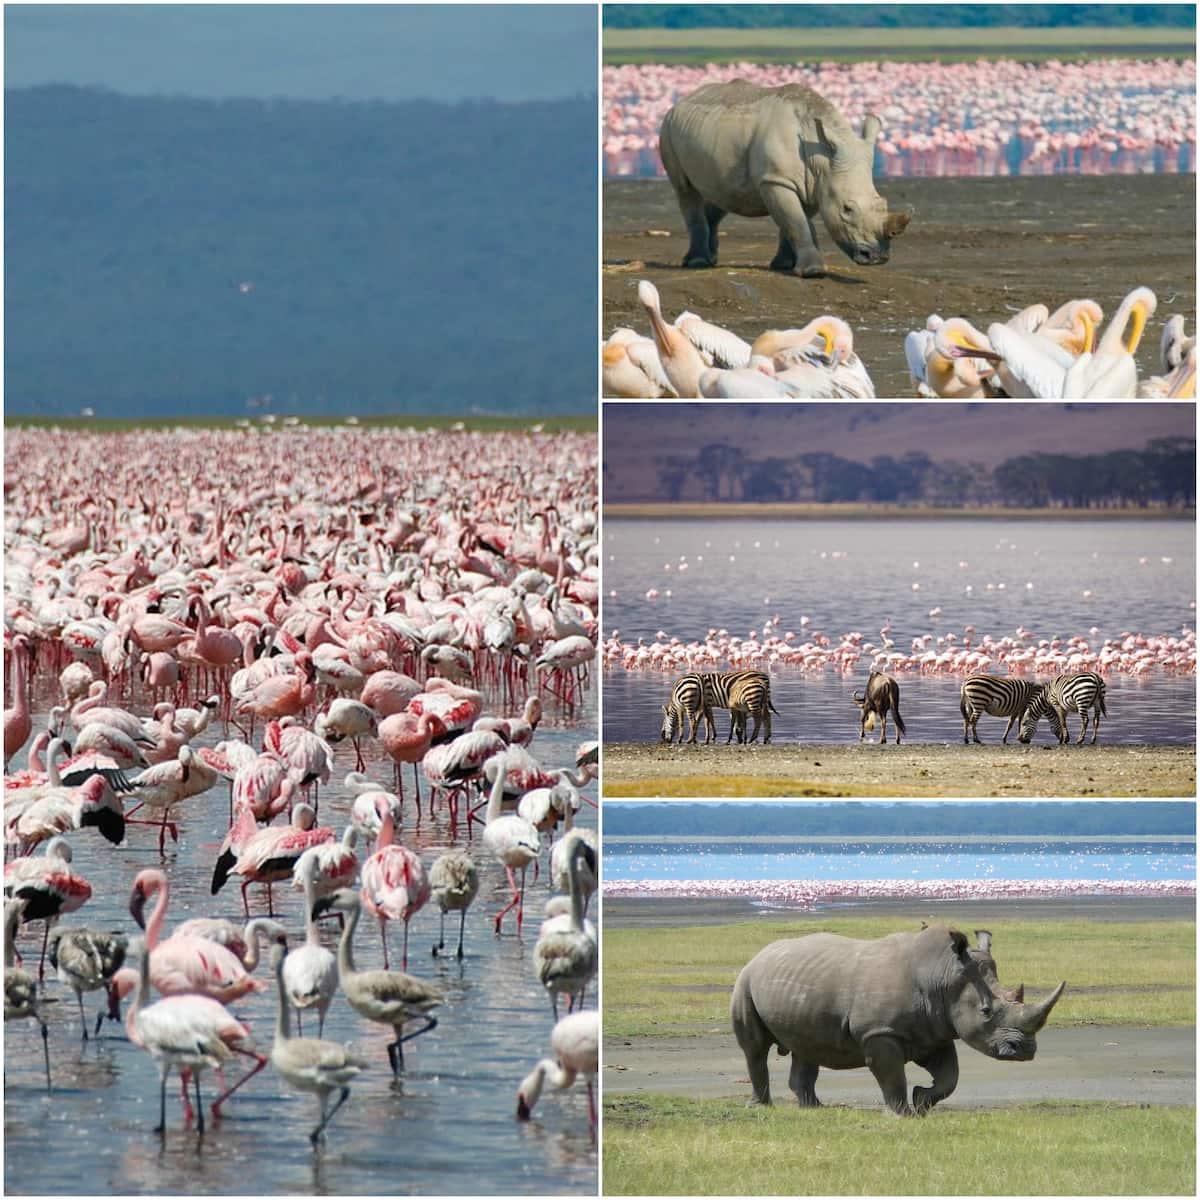 Main tourist attractions in Kenya